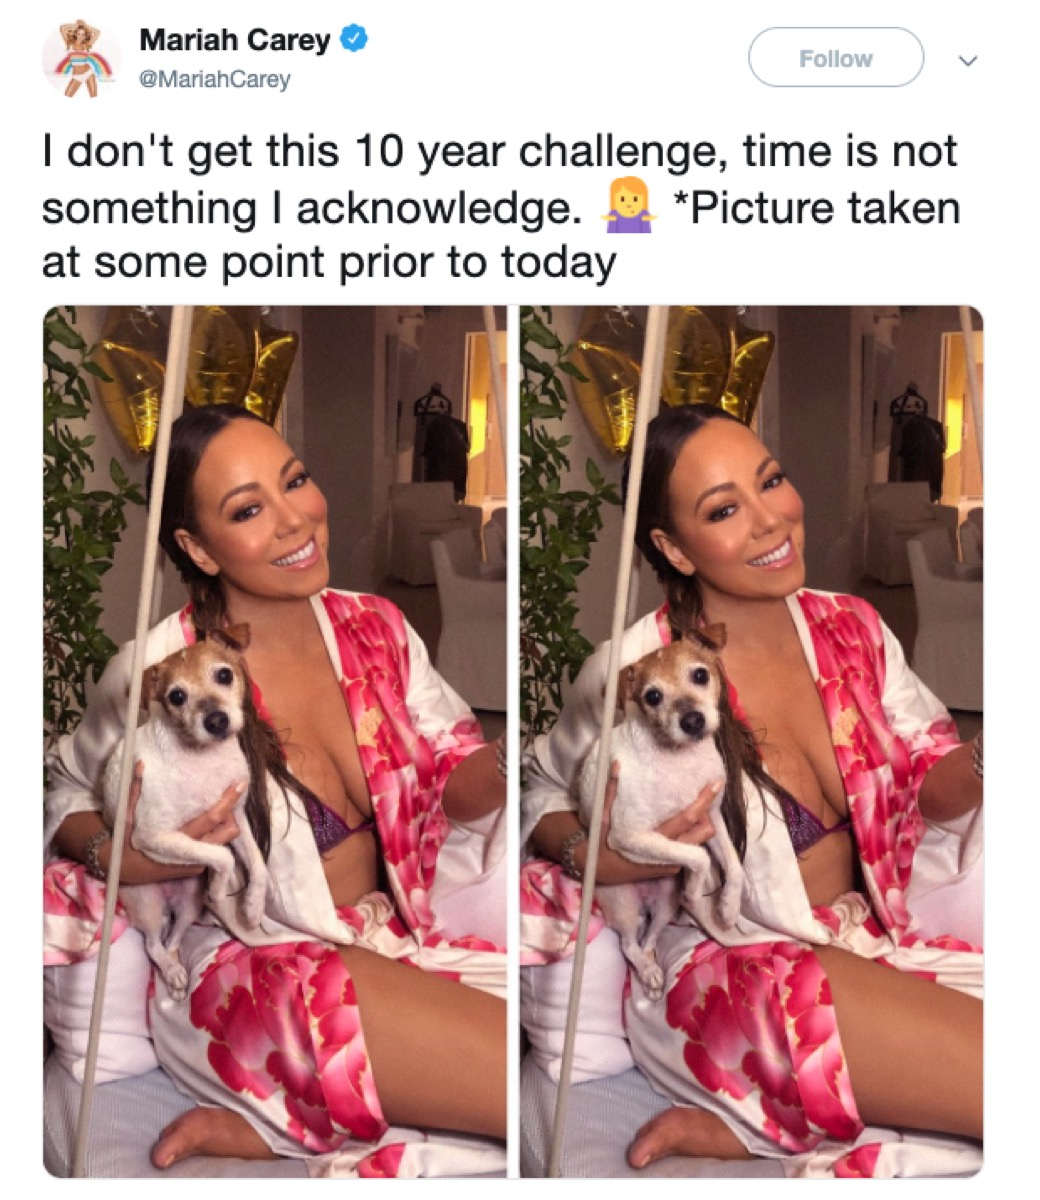 10 year challenge meme, 2019 memes